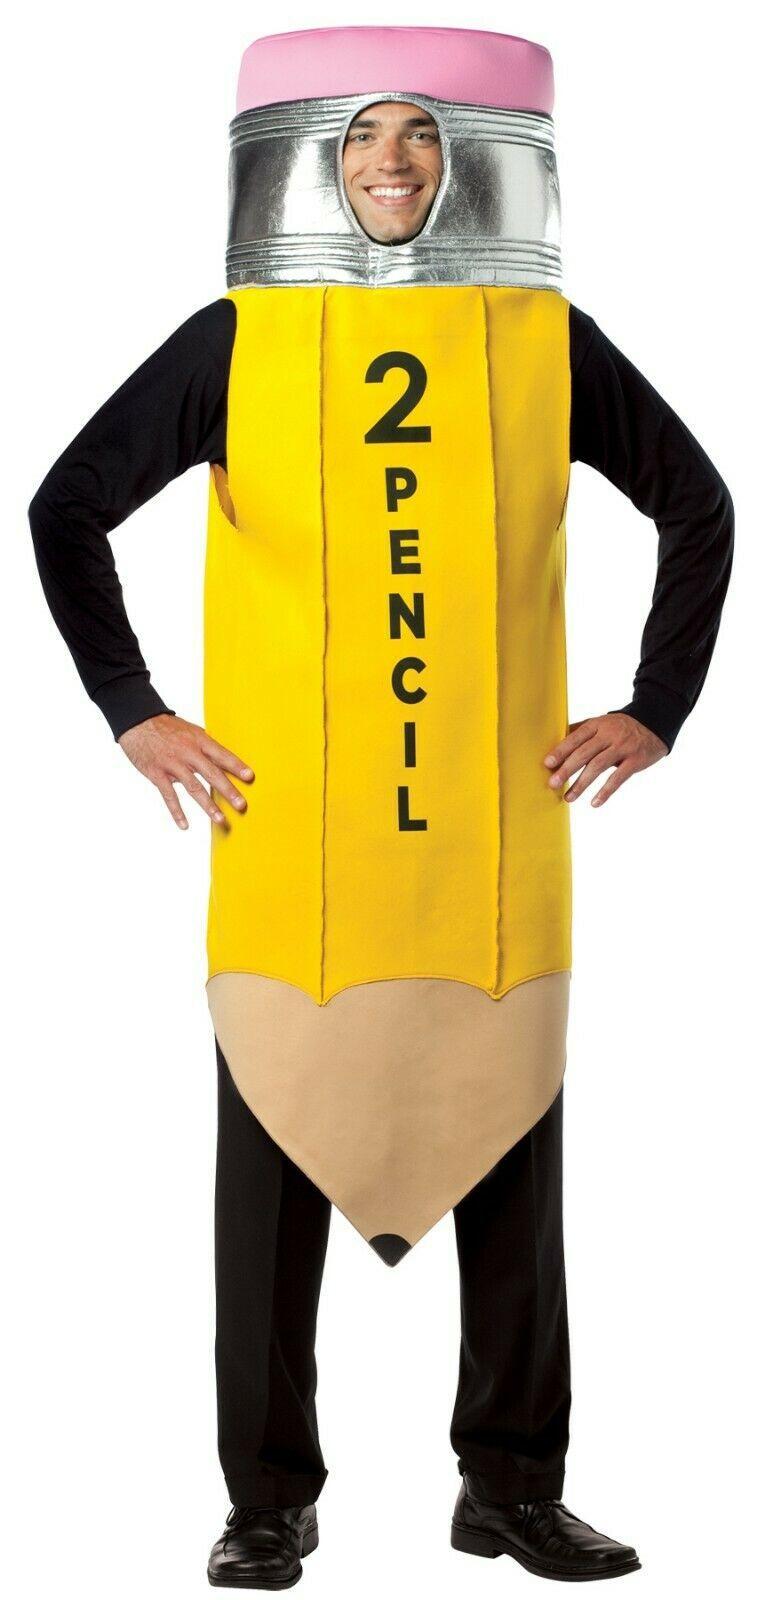 Rasta Imposta #2 Pencil Yellow Tunic Funny Adult Mens Halloween Costume GC6119